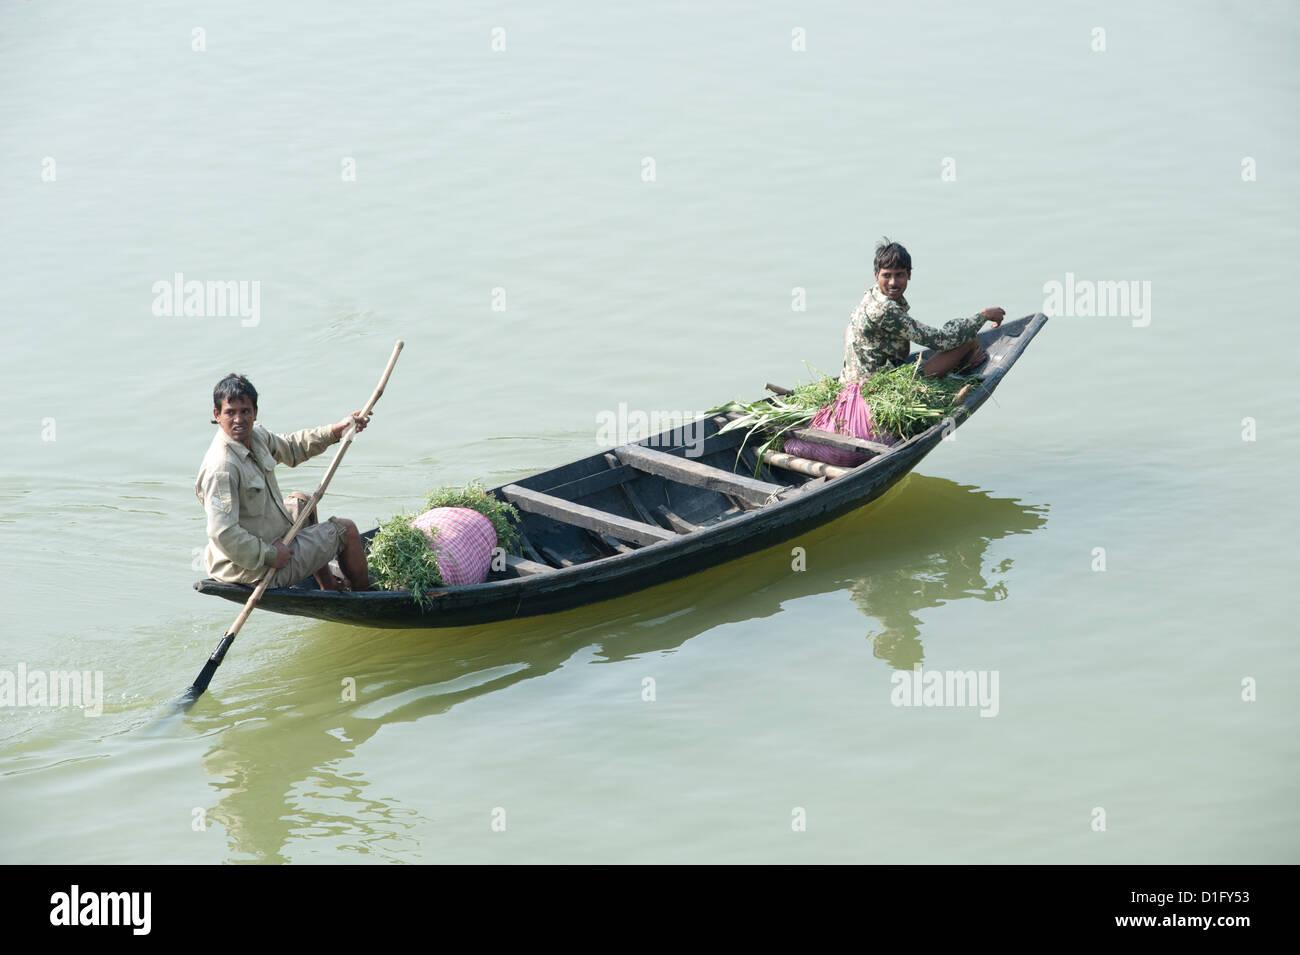 Men punting a wooden boat along the River Hugli, carrying bundles of alfalfa to market, near Kolkata, West Bengal, - Stock Image